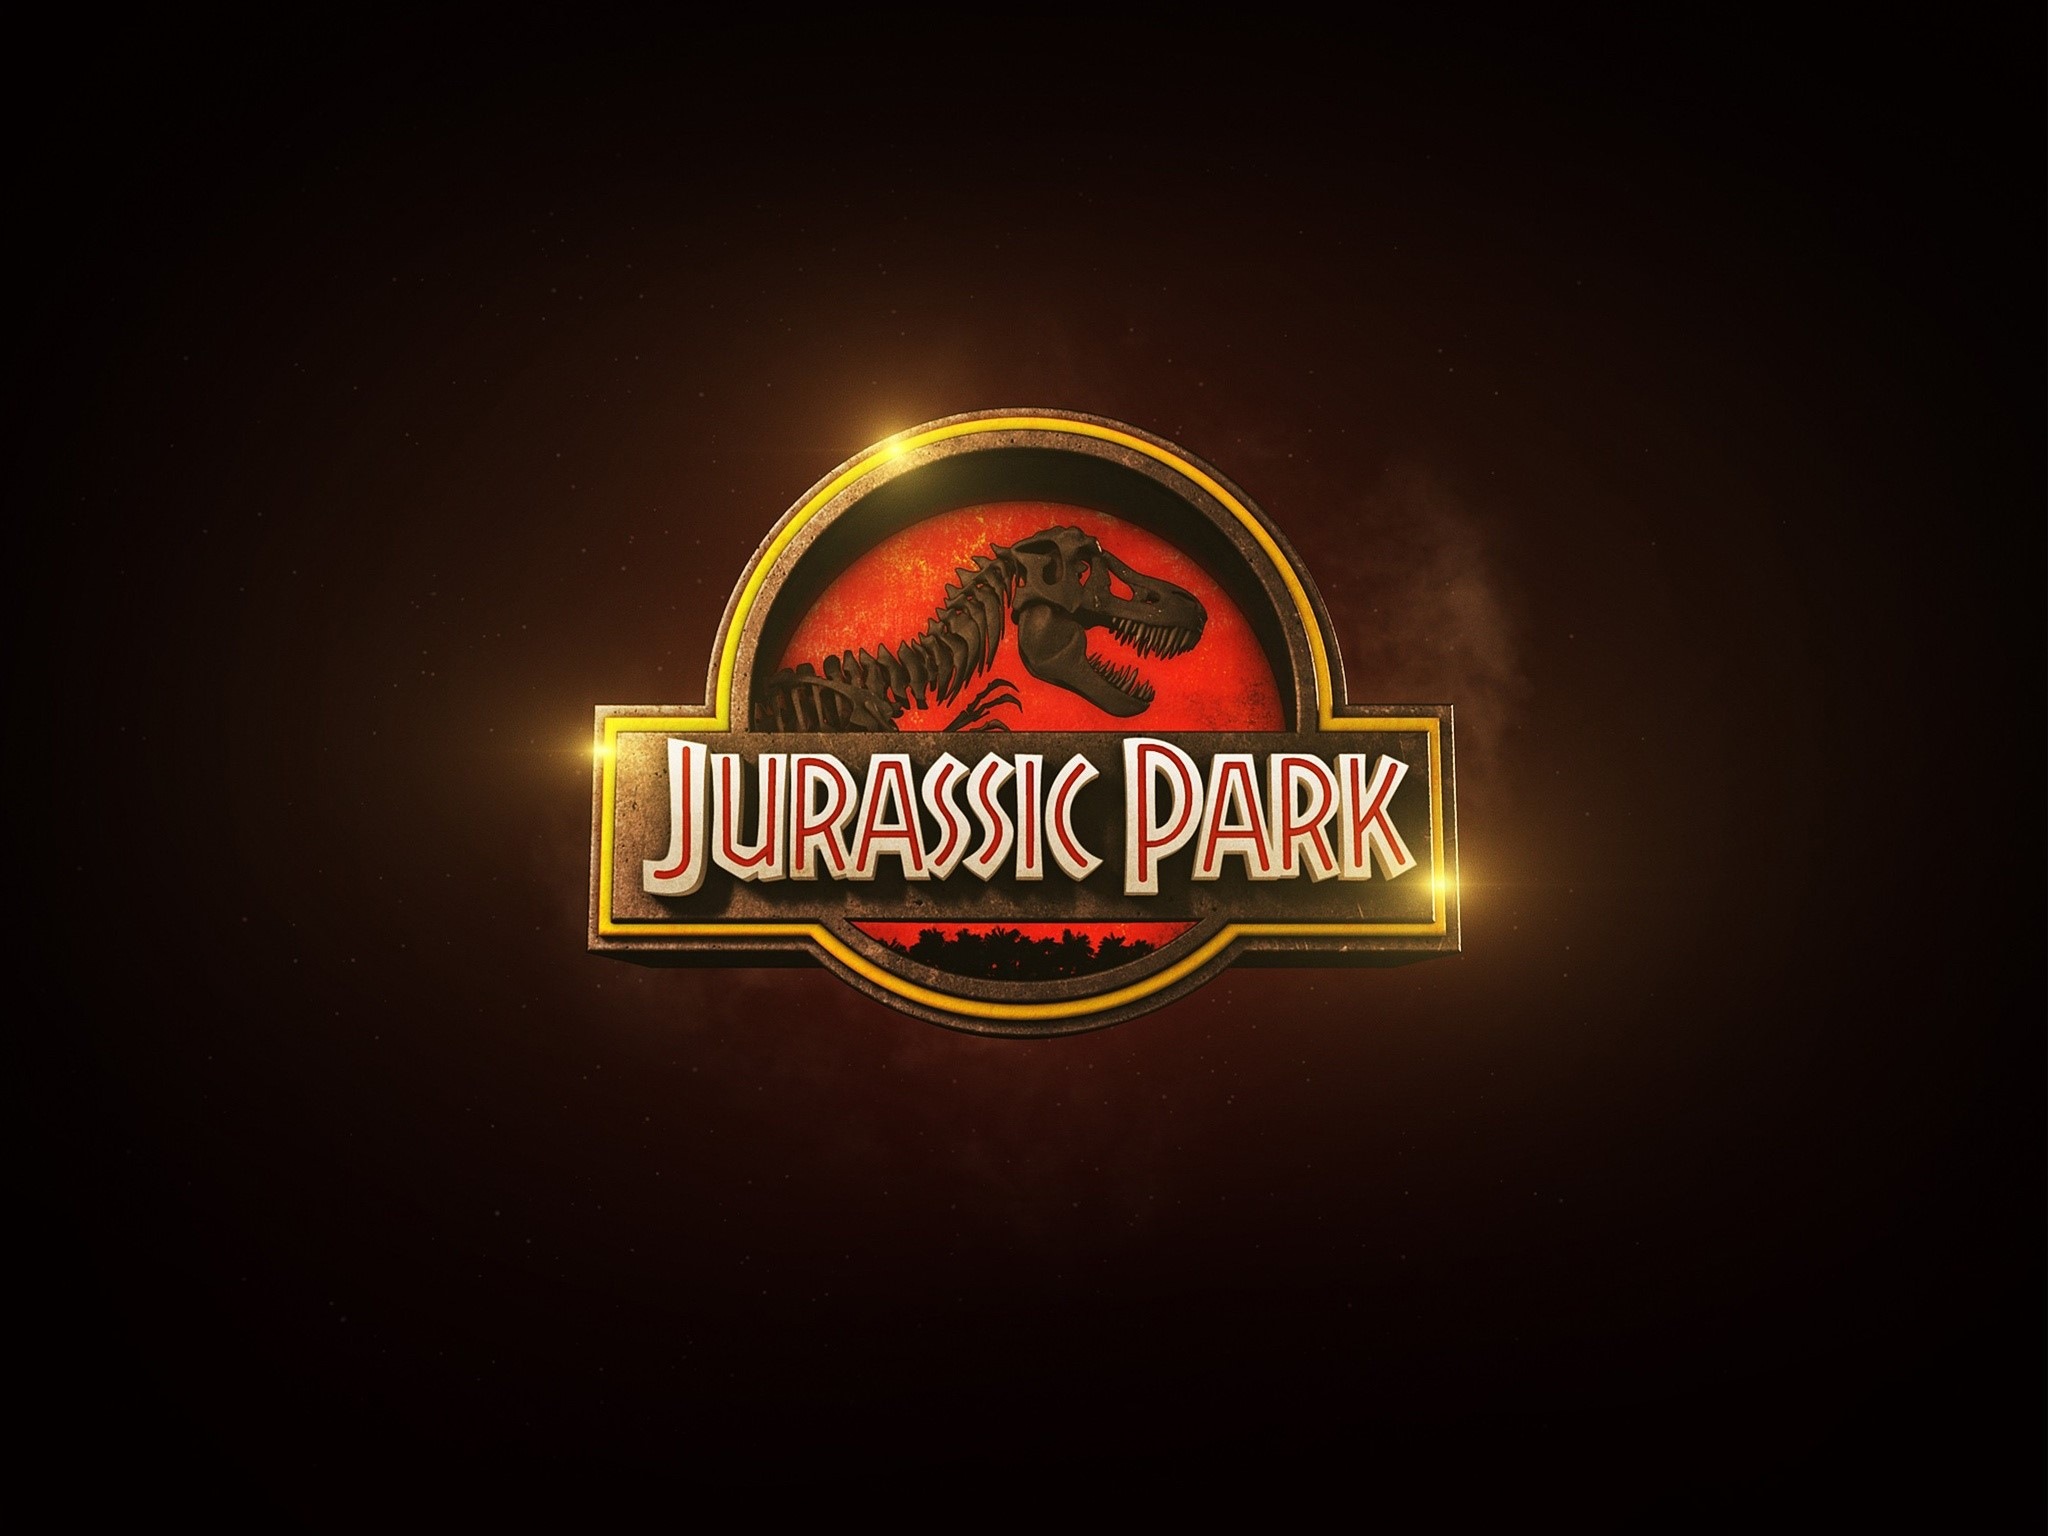 Fondos de pantalla Jurassic Park